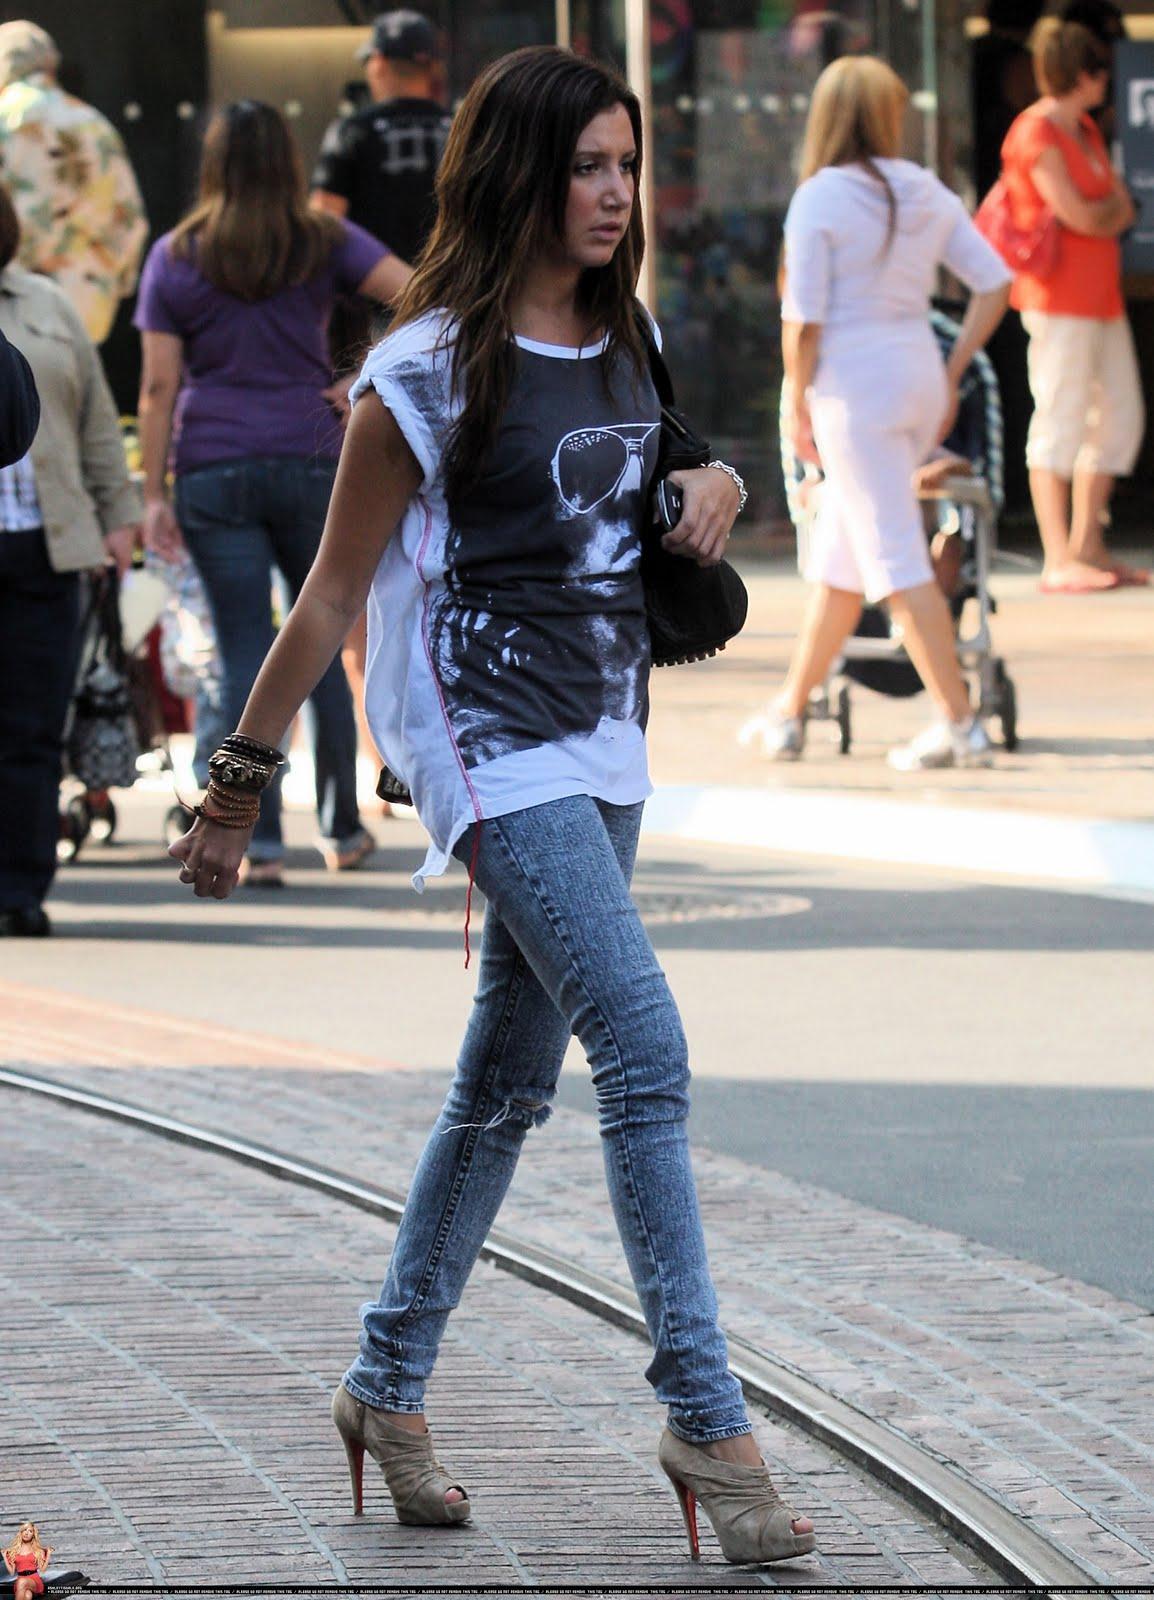 [Ashley_tisdale-skinny+jeans.jpg]